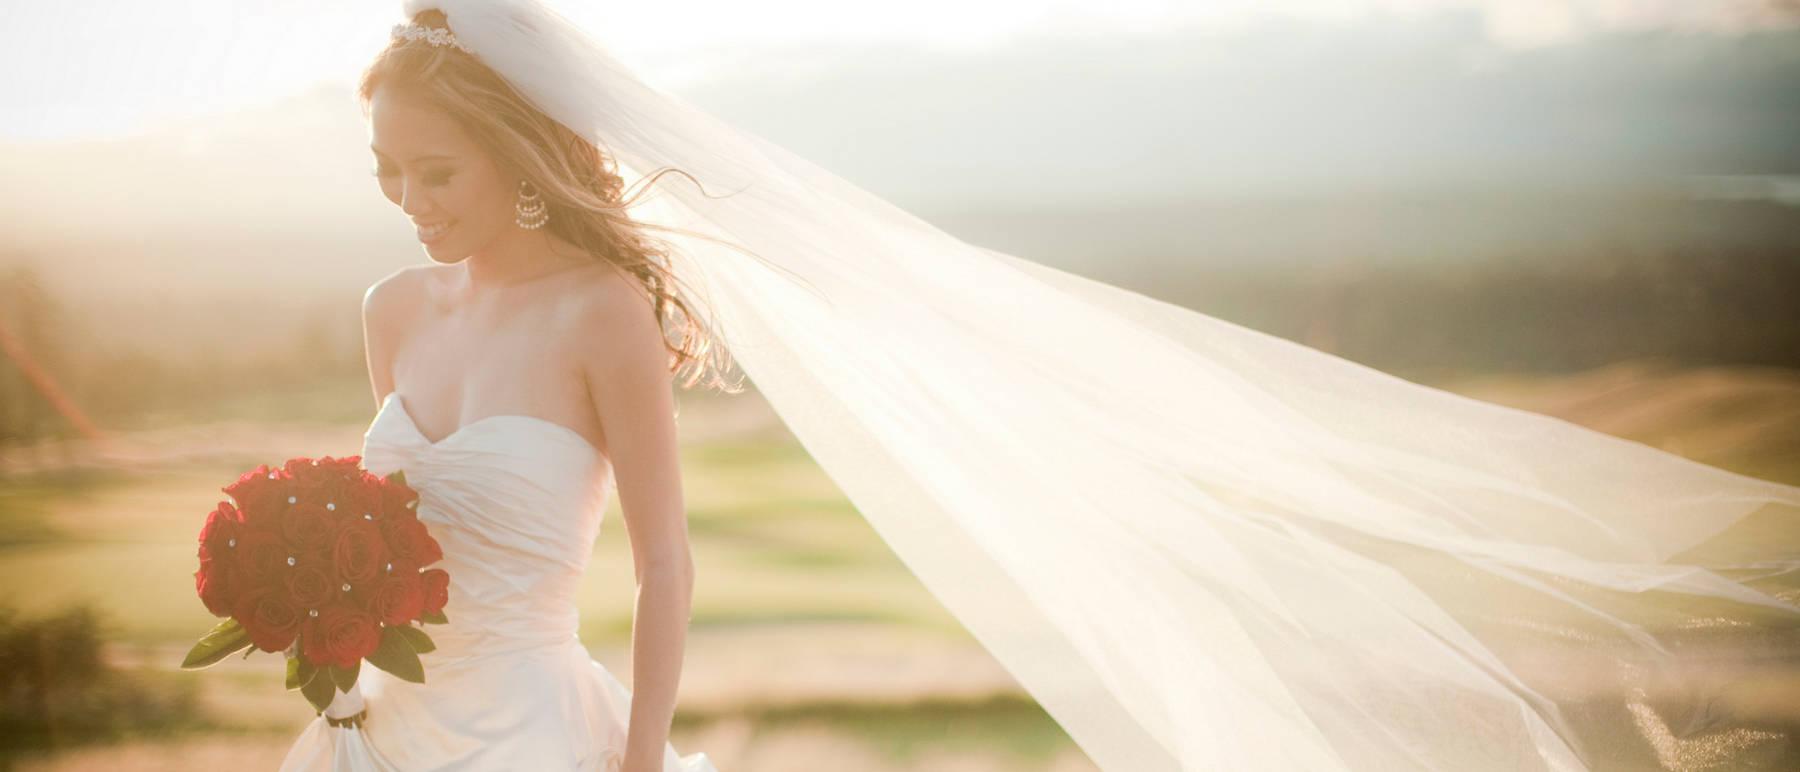 johnandjoseph-wedding-photographer-hz-slider-299